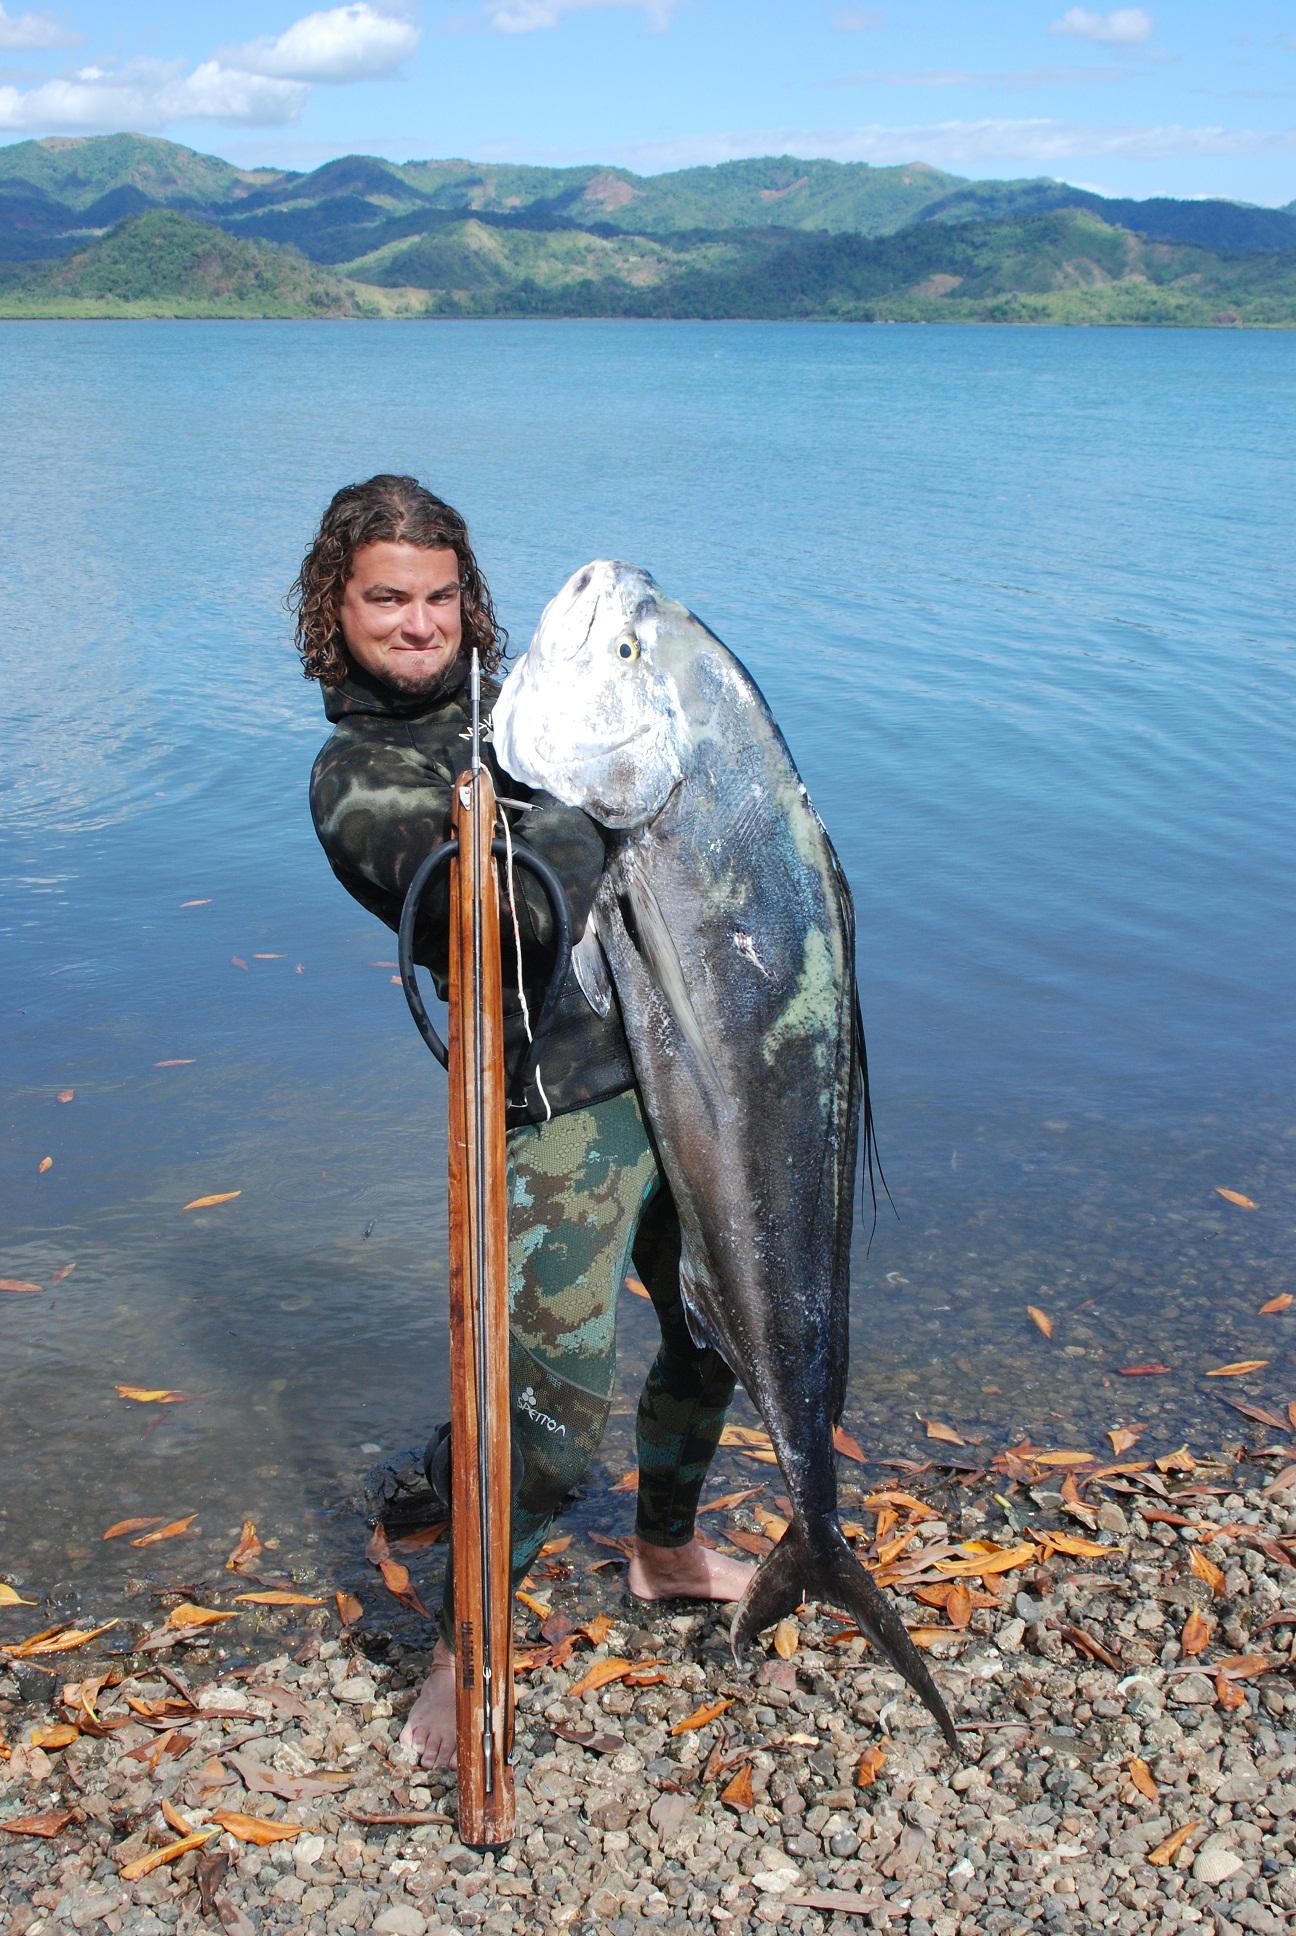 Single Girl Hd Wallpaper Rooster Fish Spearfishing Panama